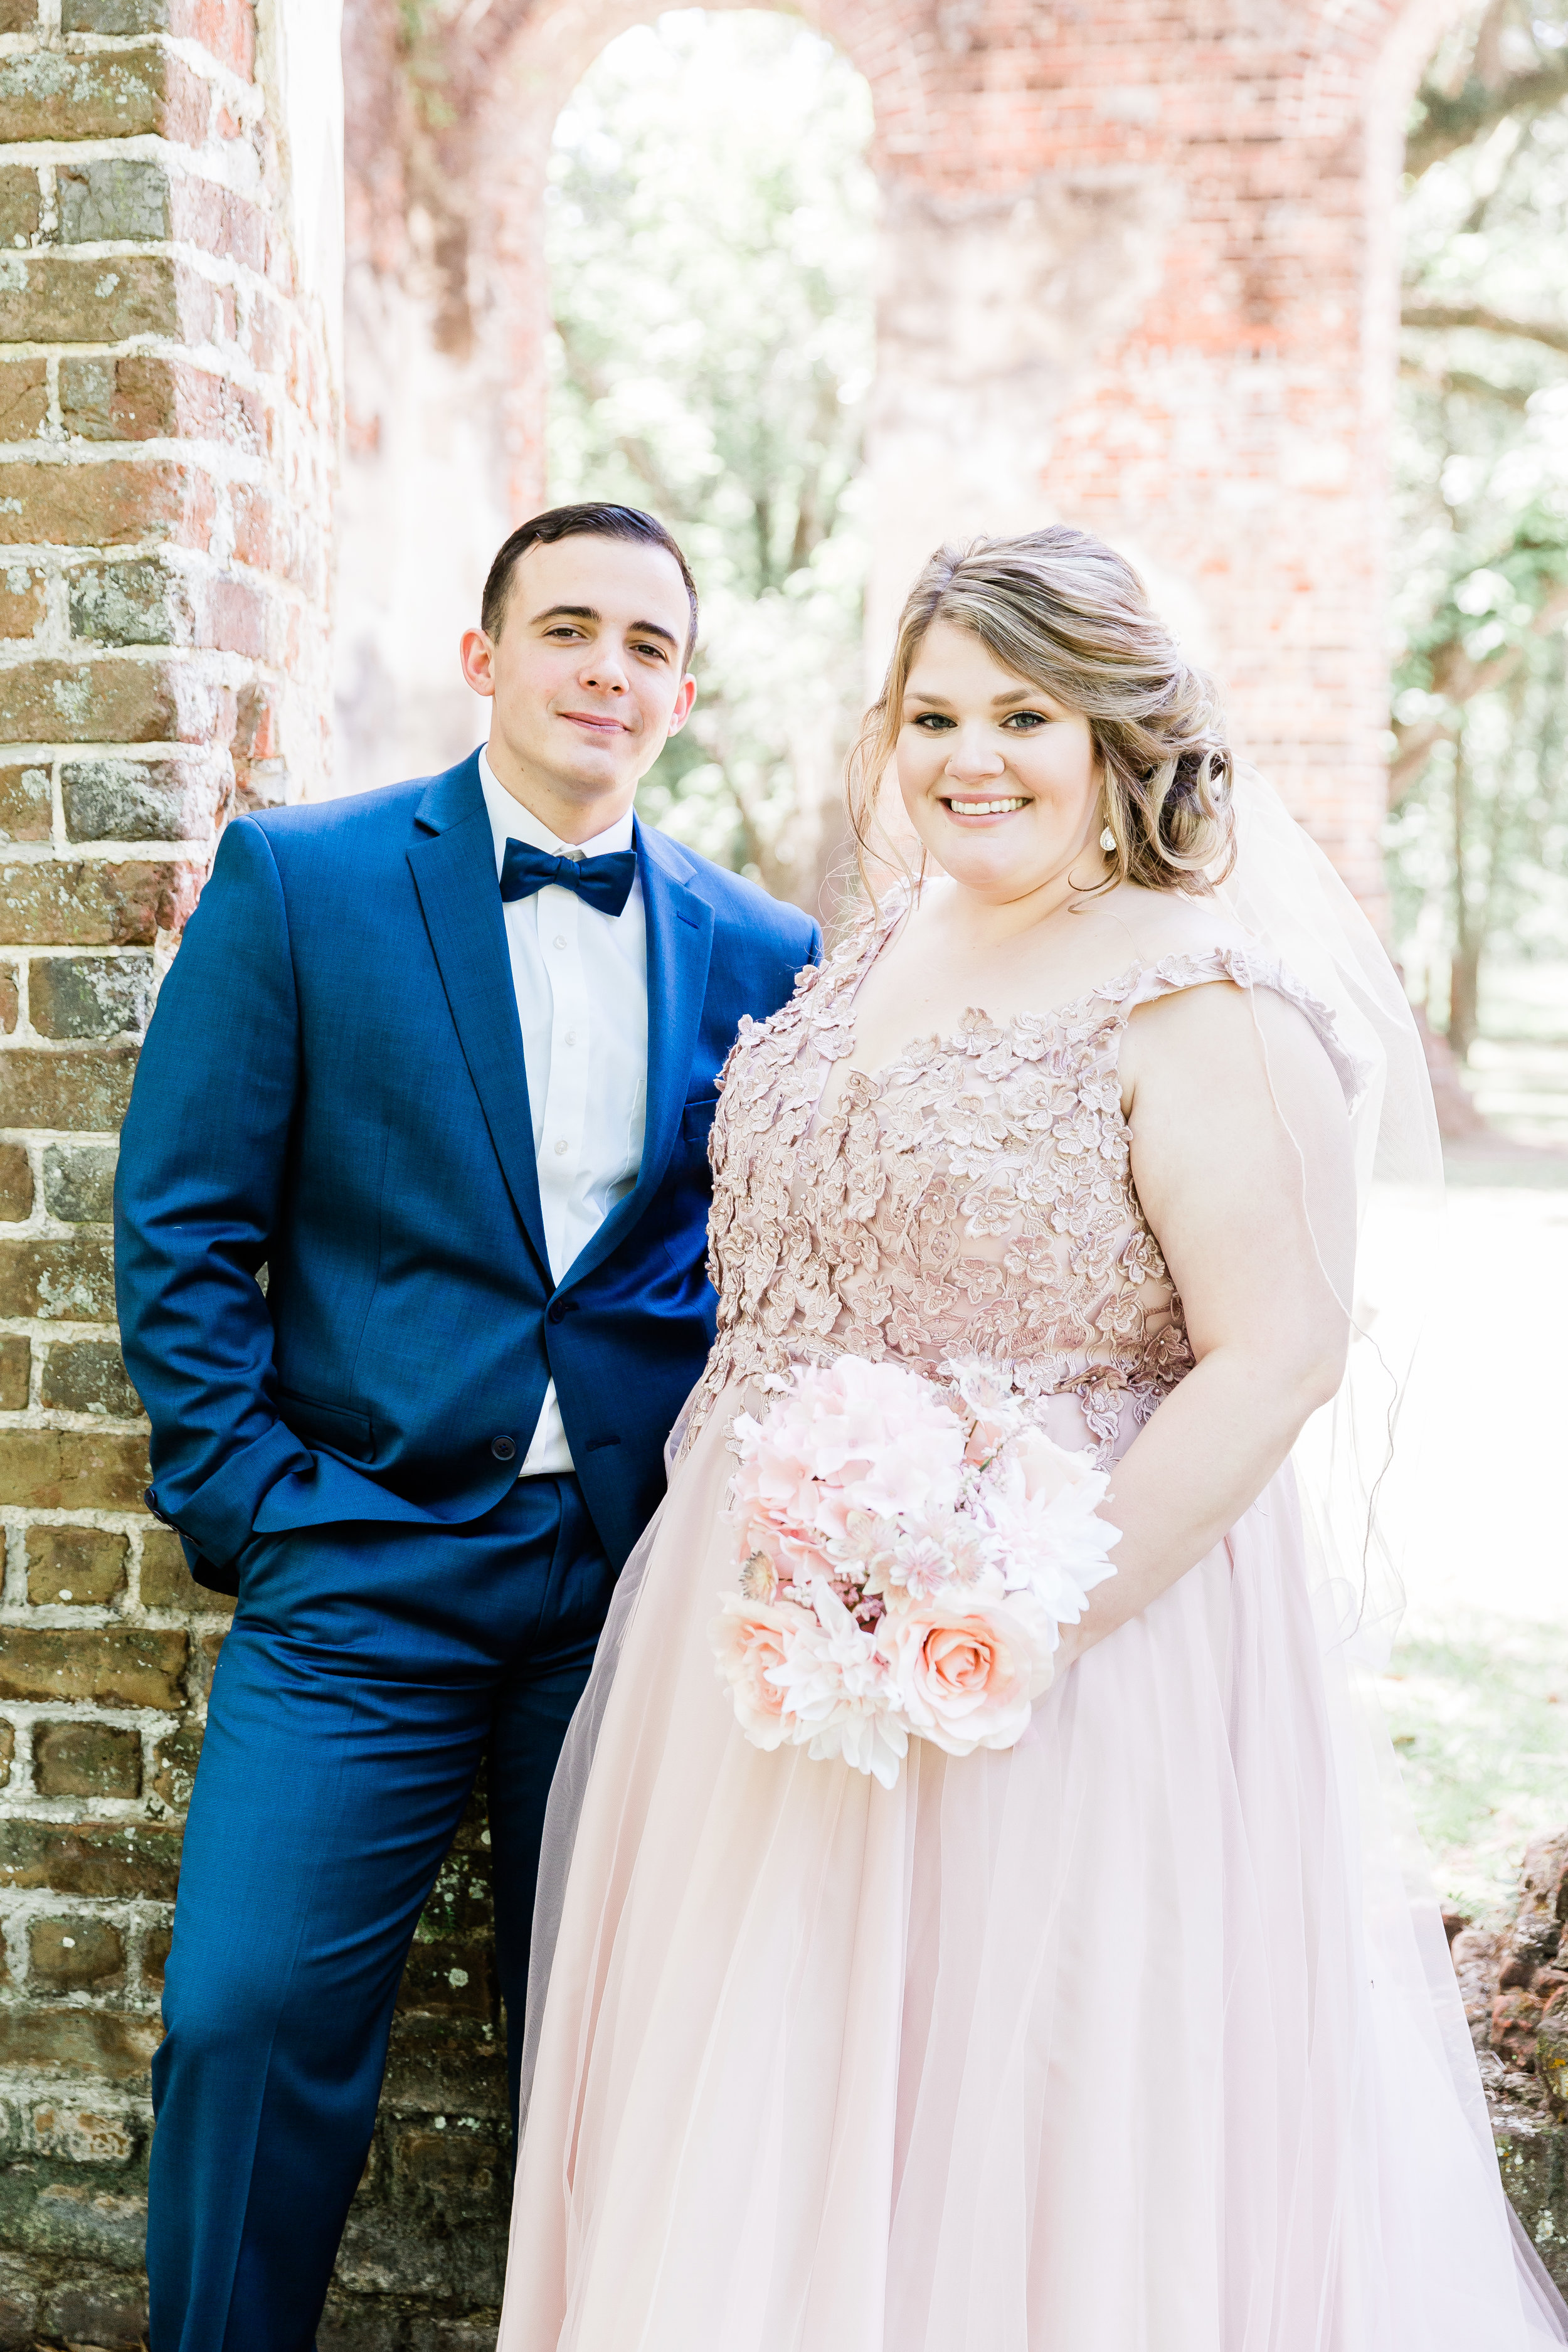 20190417-Southern Lens Photography-savannah family photographer- Ashley and Zack-old sheldon church ruins-201964.jpg